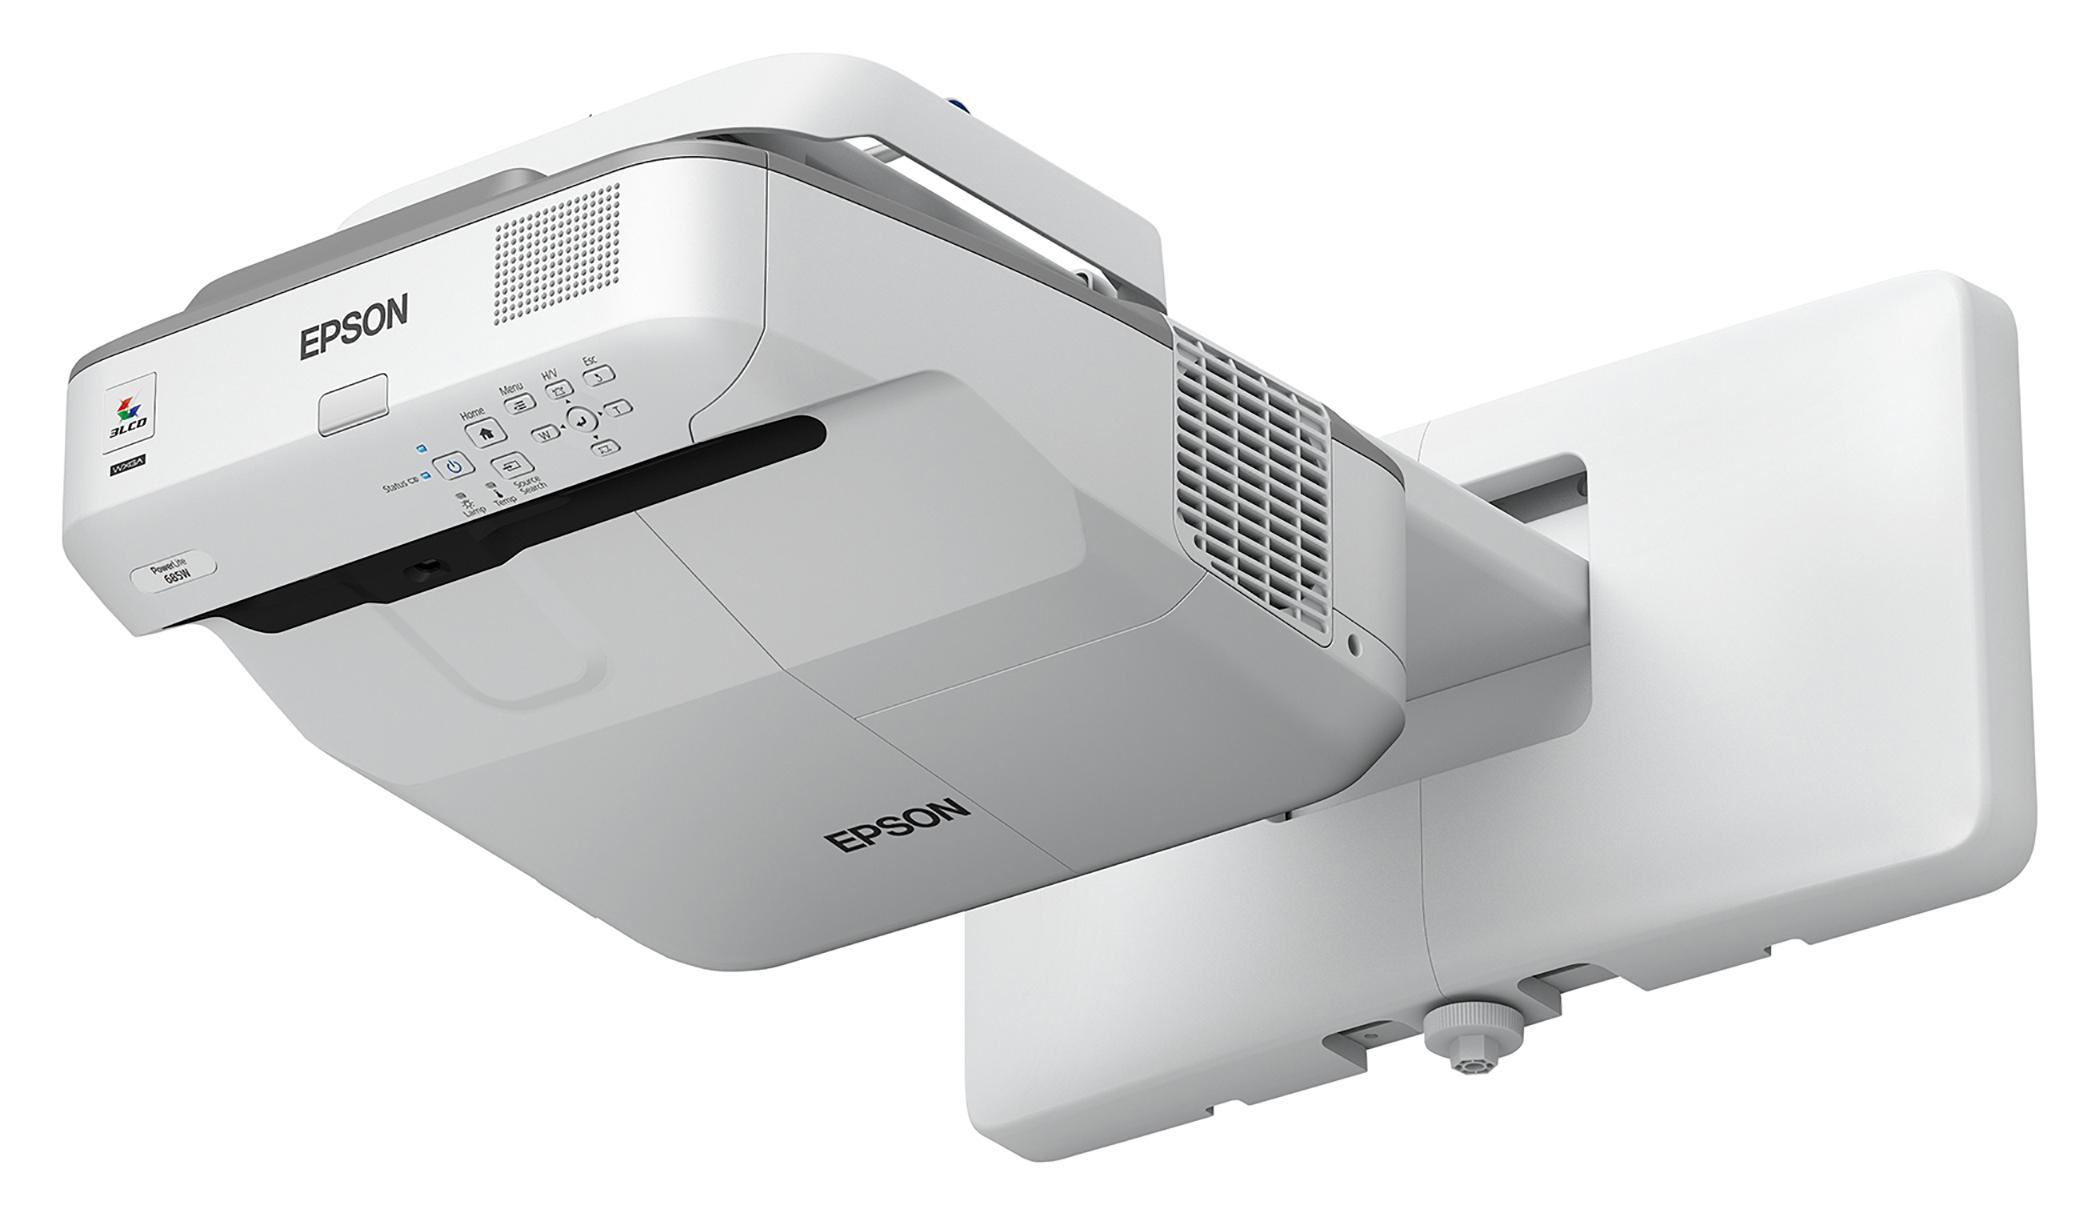 EPSON PowerLite 685W 3500lm WXGA Ultra Short-Throw Projector, Refurbished